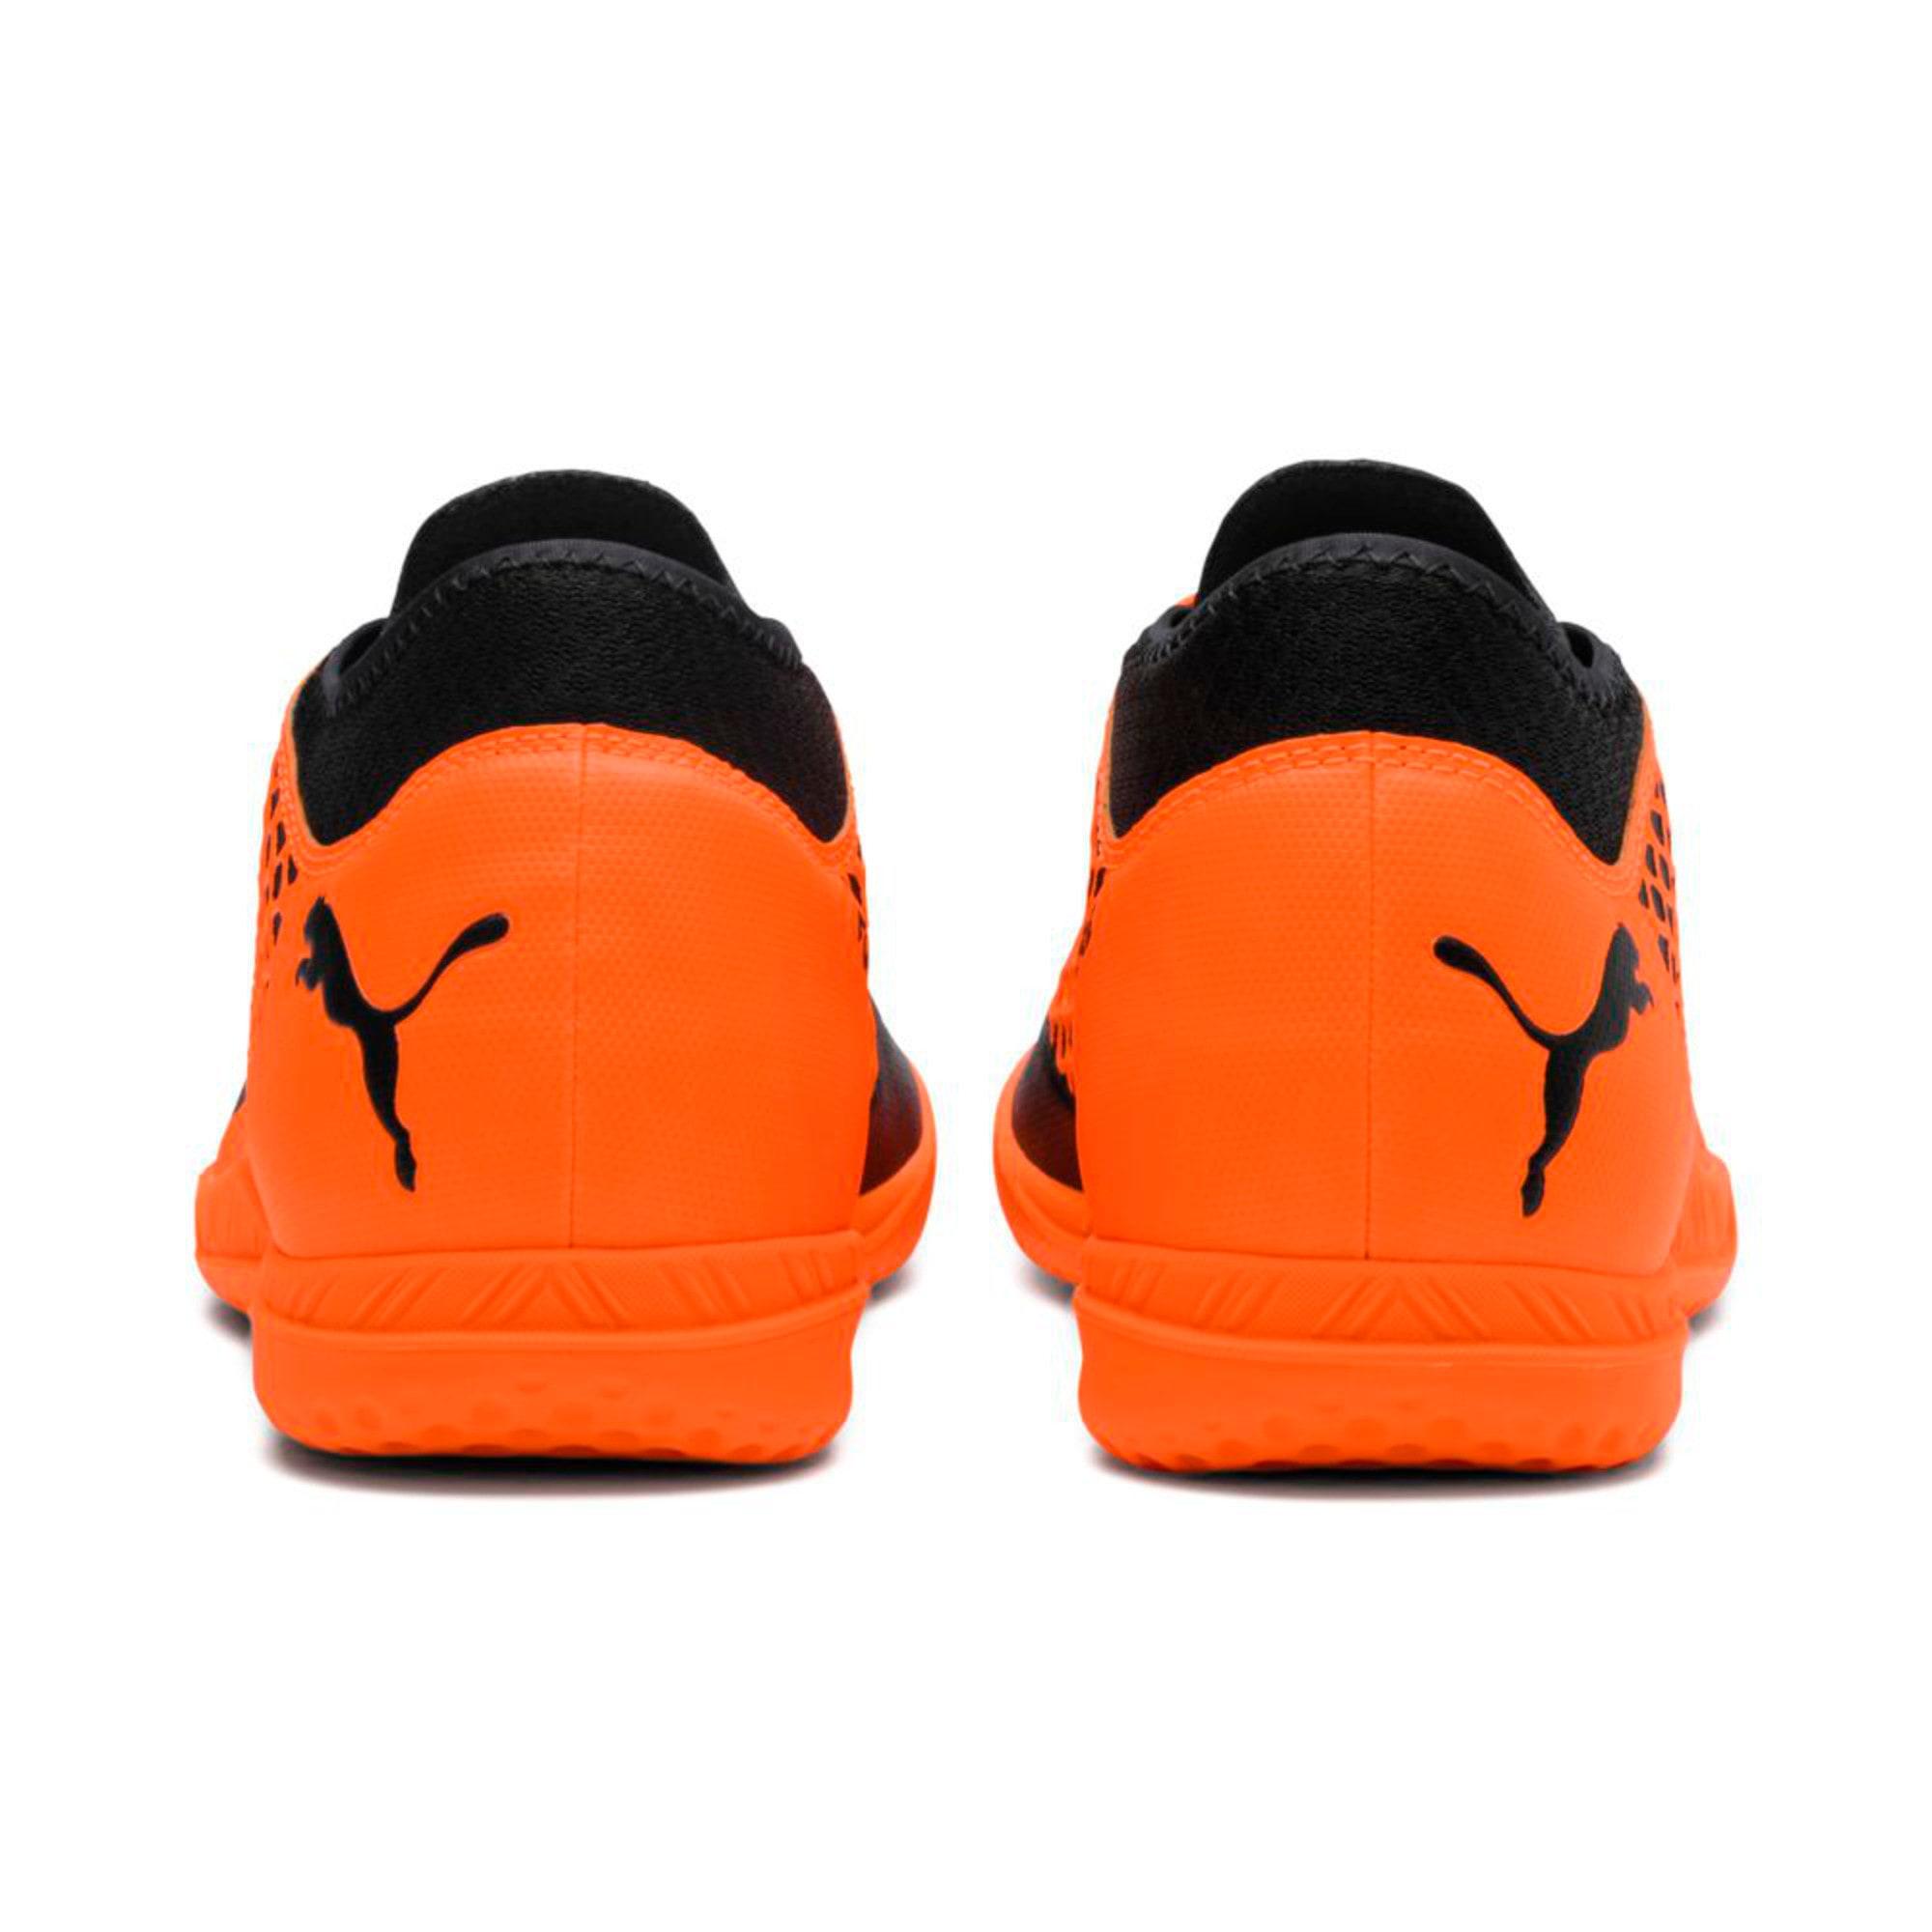 Thumbnail 3 of FUTURE 2.4 IT  Football Shoes, Black-Orange, medium-IND